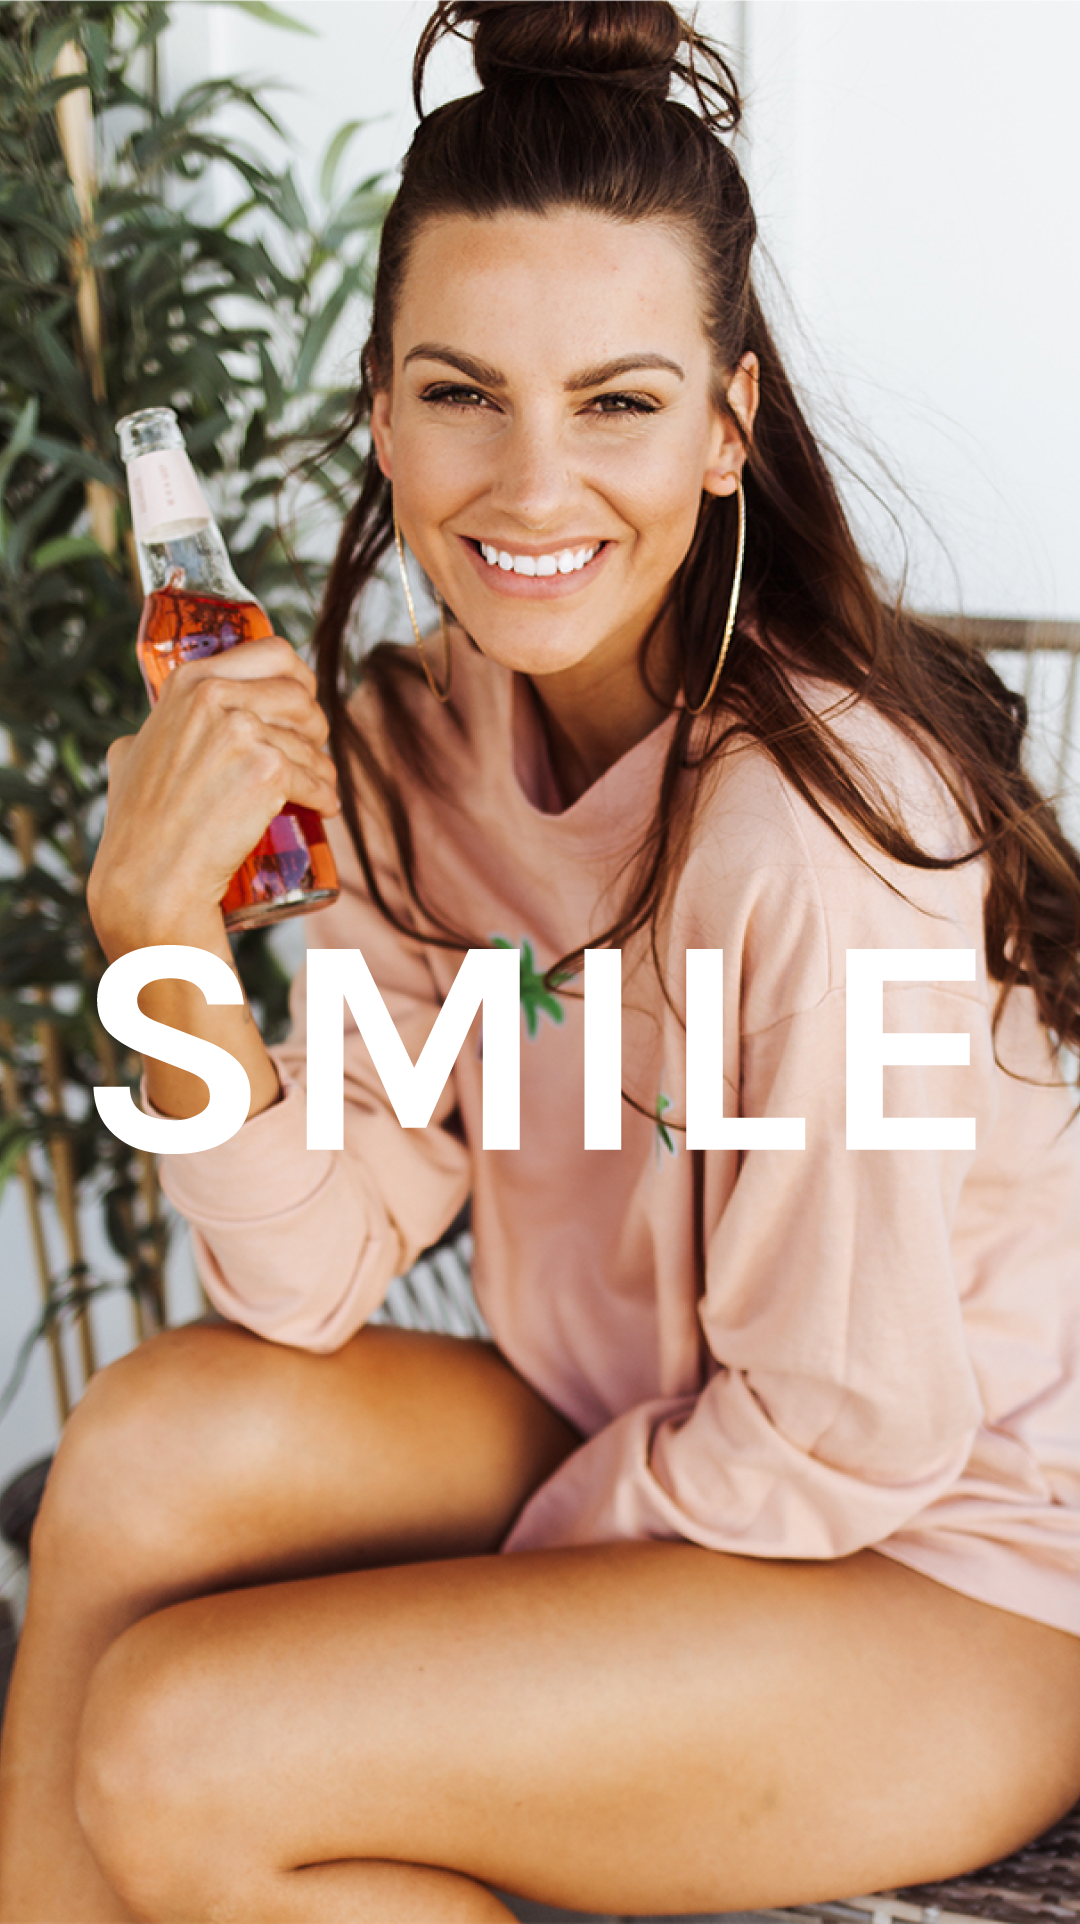 Smile_3b.png